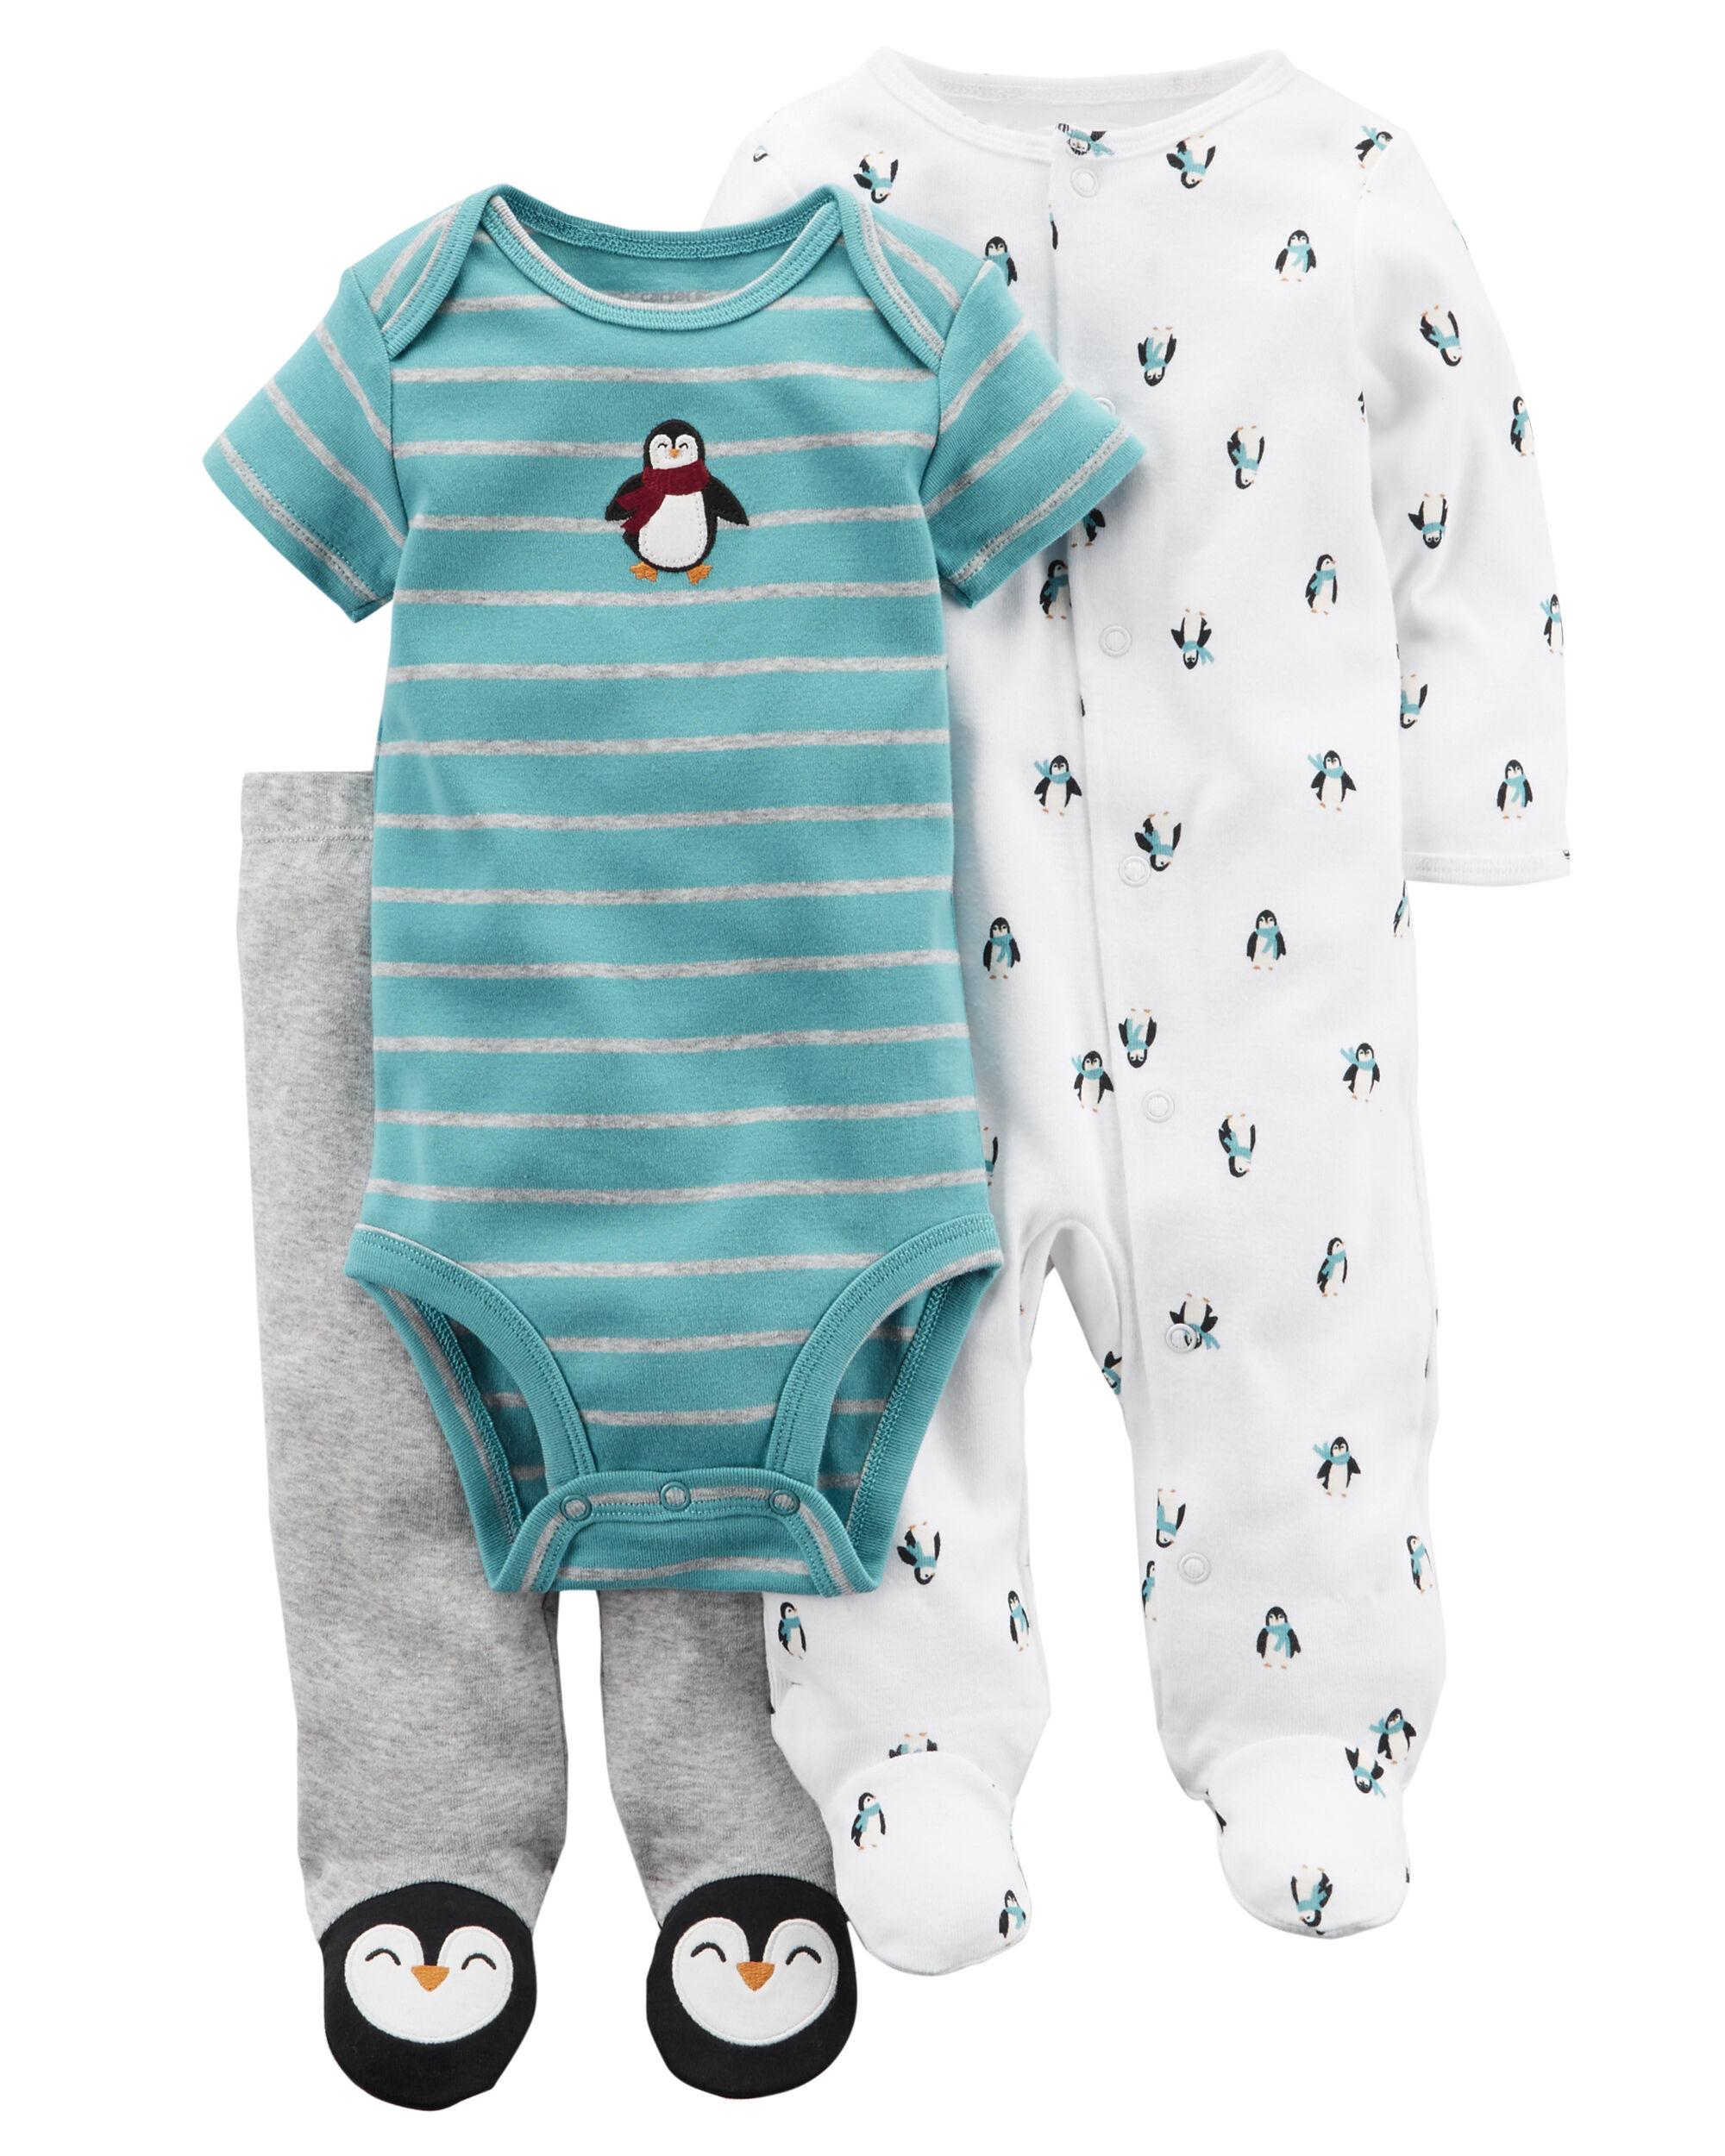 Baby Boy Sets | Gift Sets | Carter's